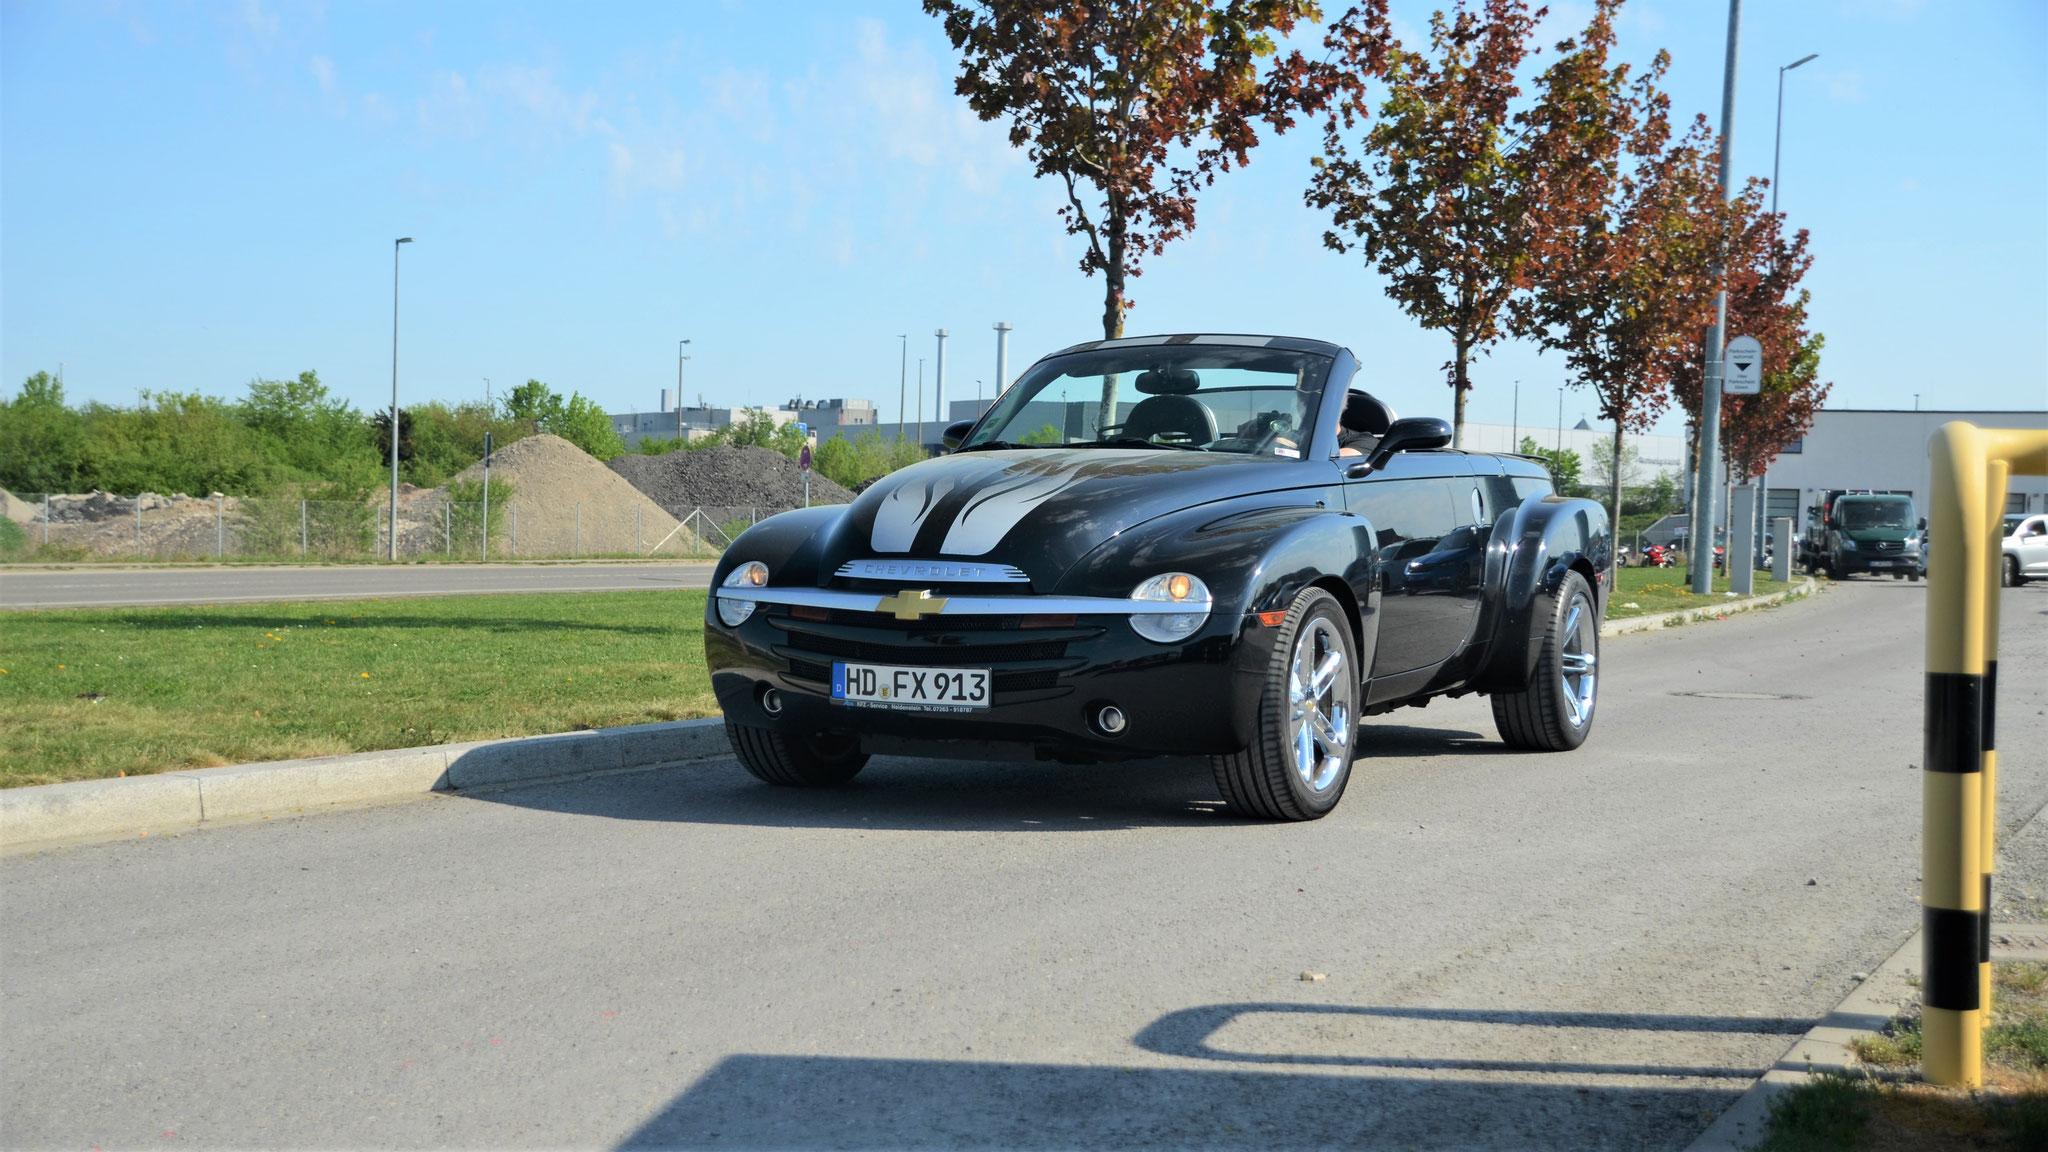 Chevrolet SSR - HD-FX-913